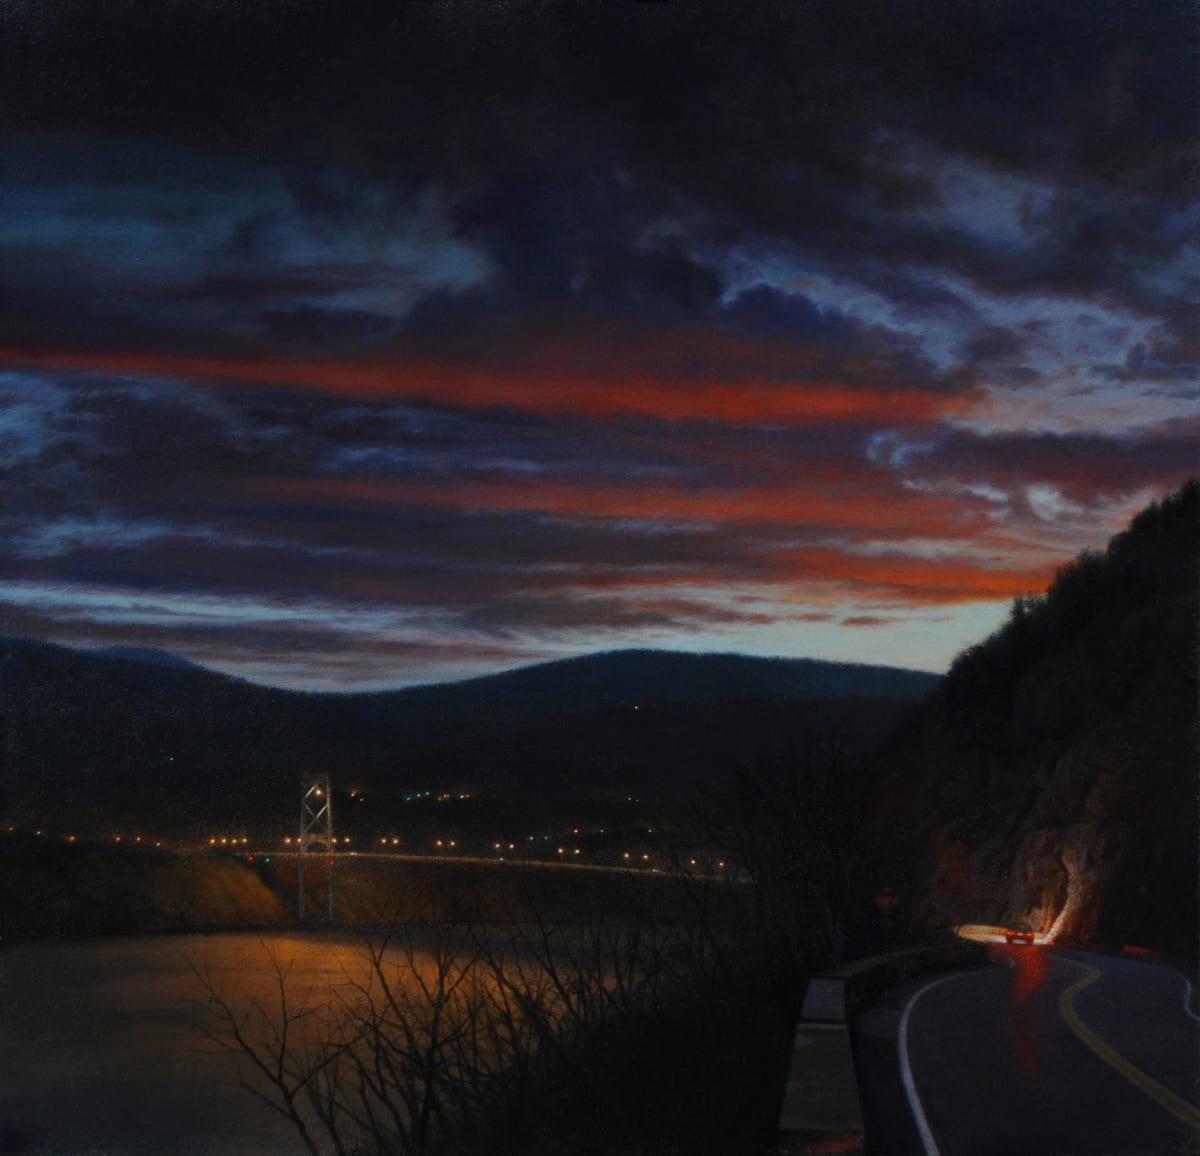 "Stephen Fox Fade Oil on canvas 24 x 25"" - 2010 63.5 x 61 cm"